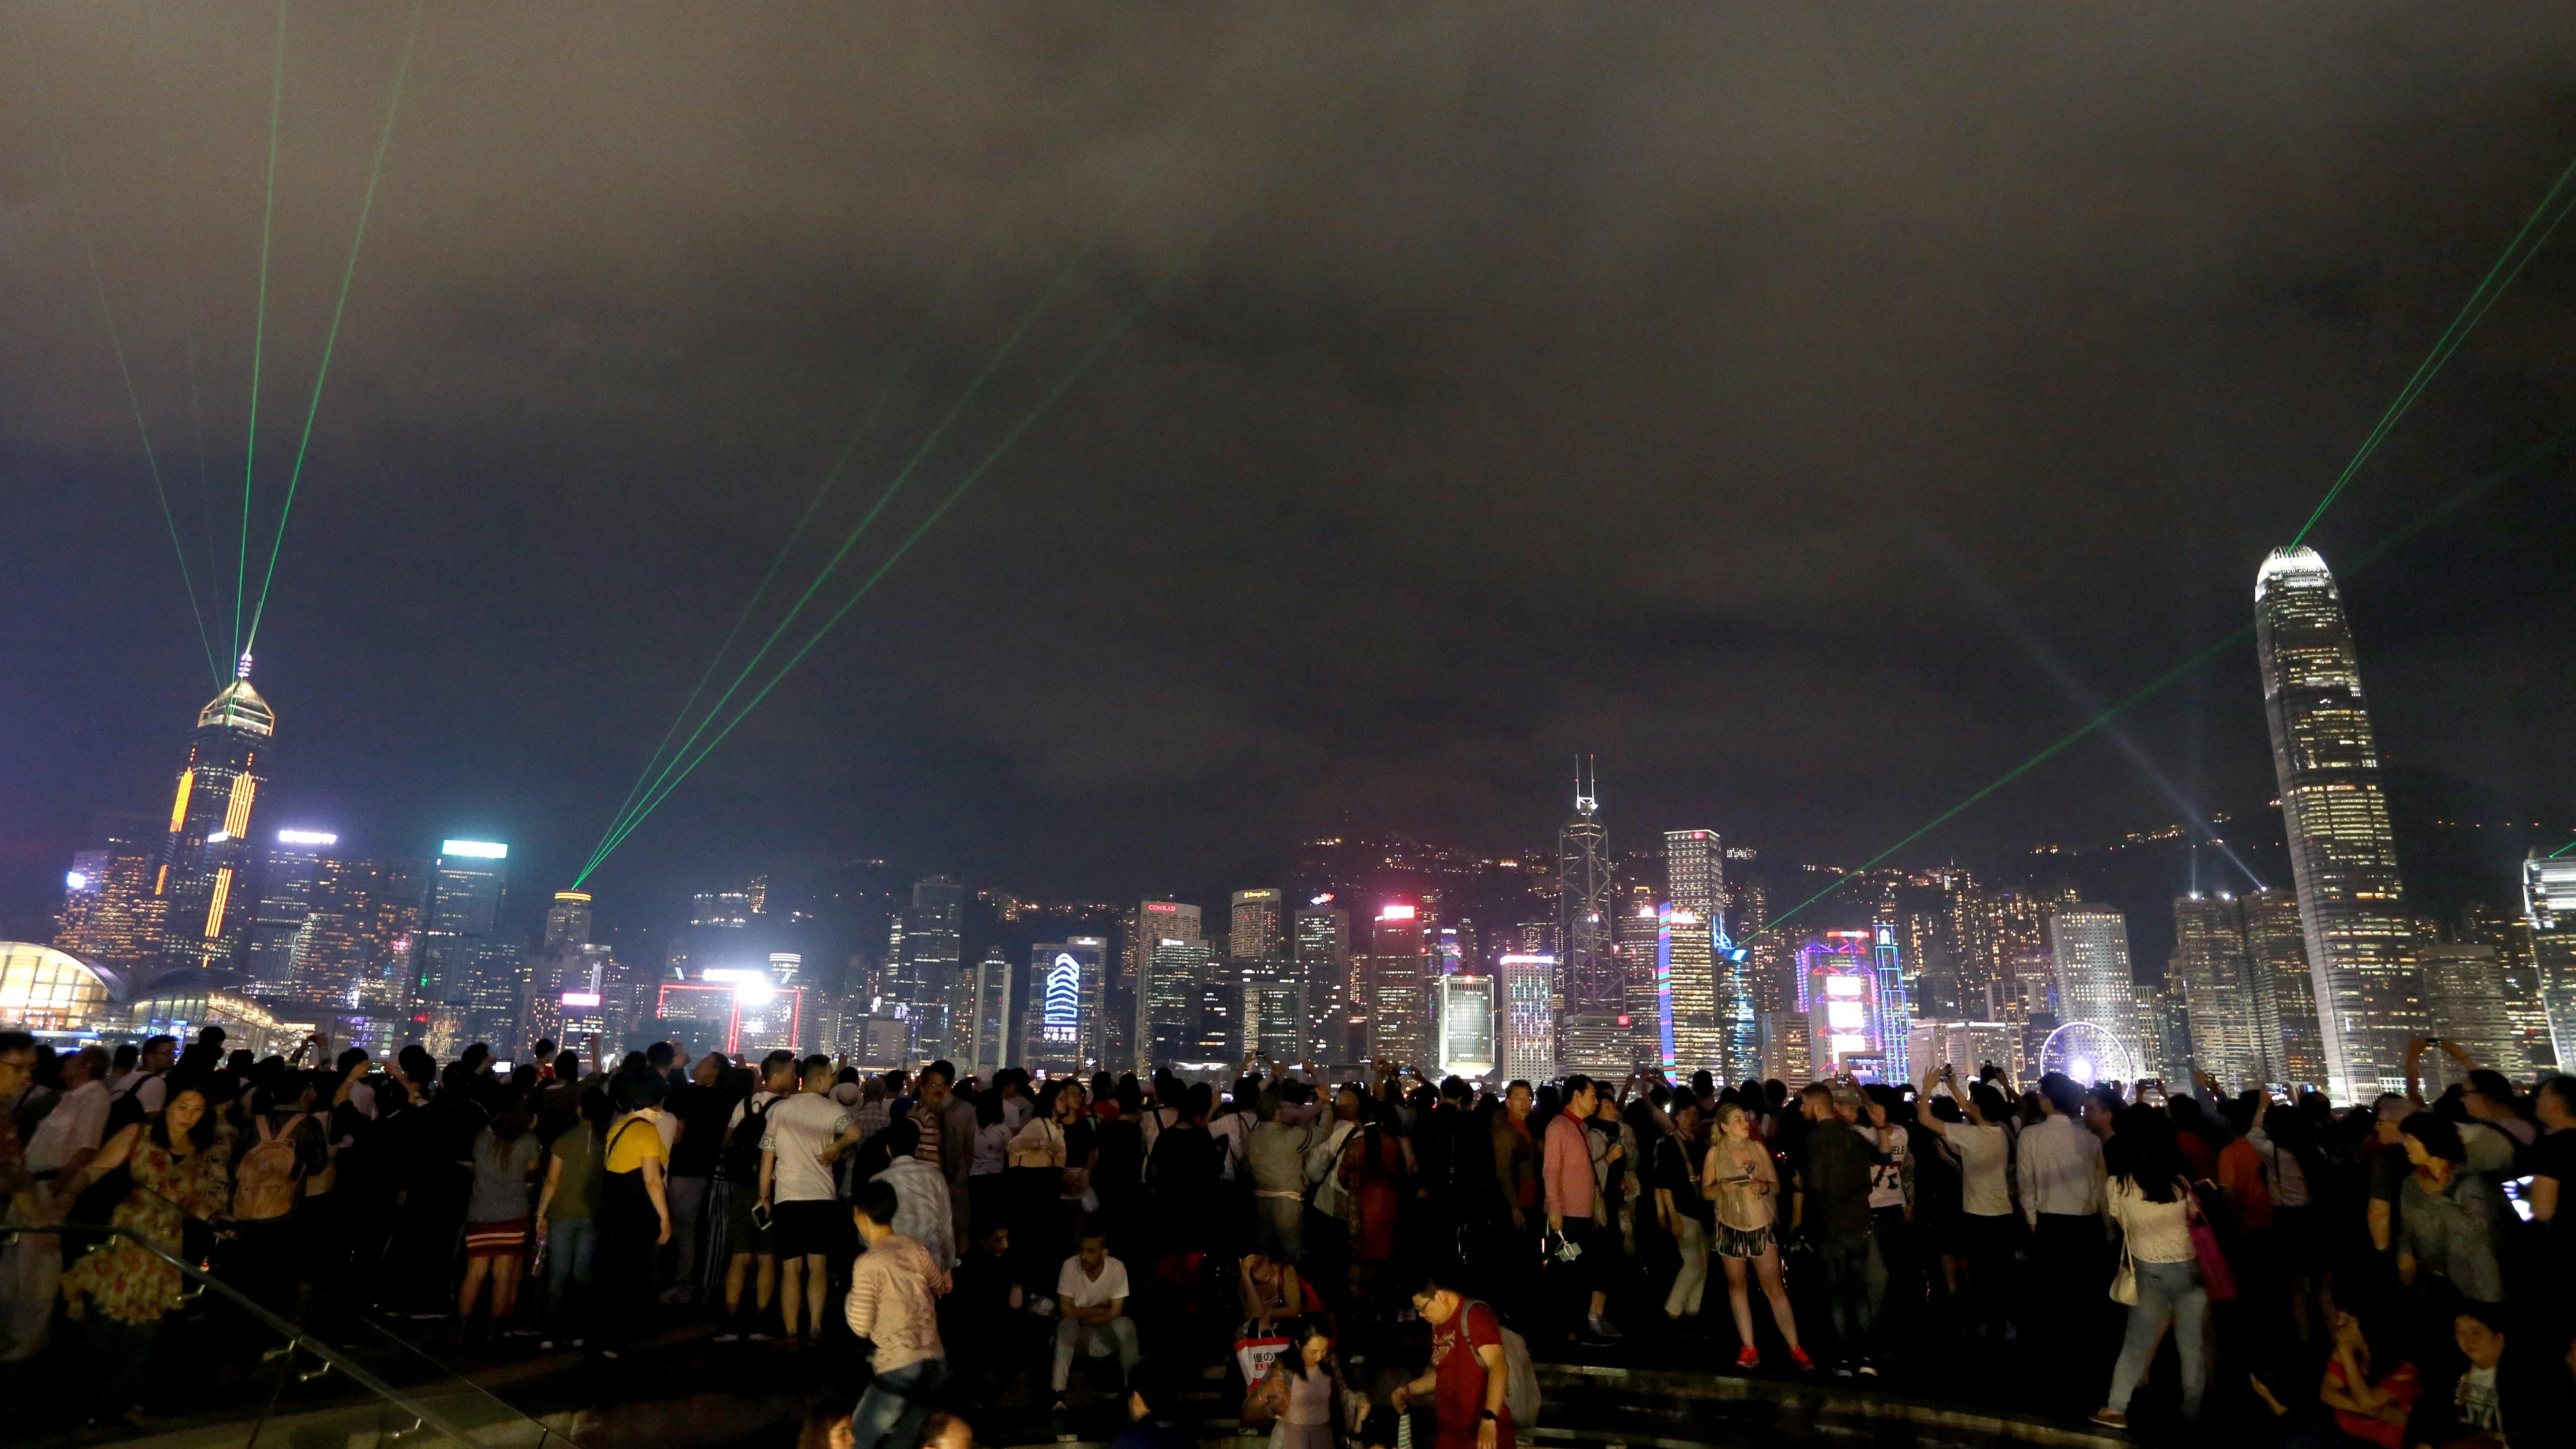 Lyon S Spectacular Festival Of Lights Gives Nod To Hong Kong